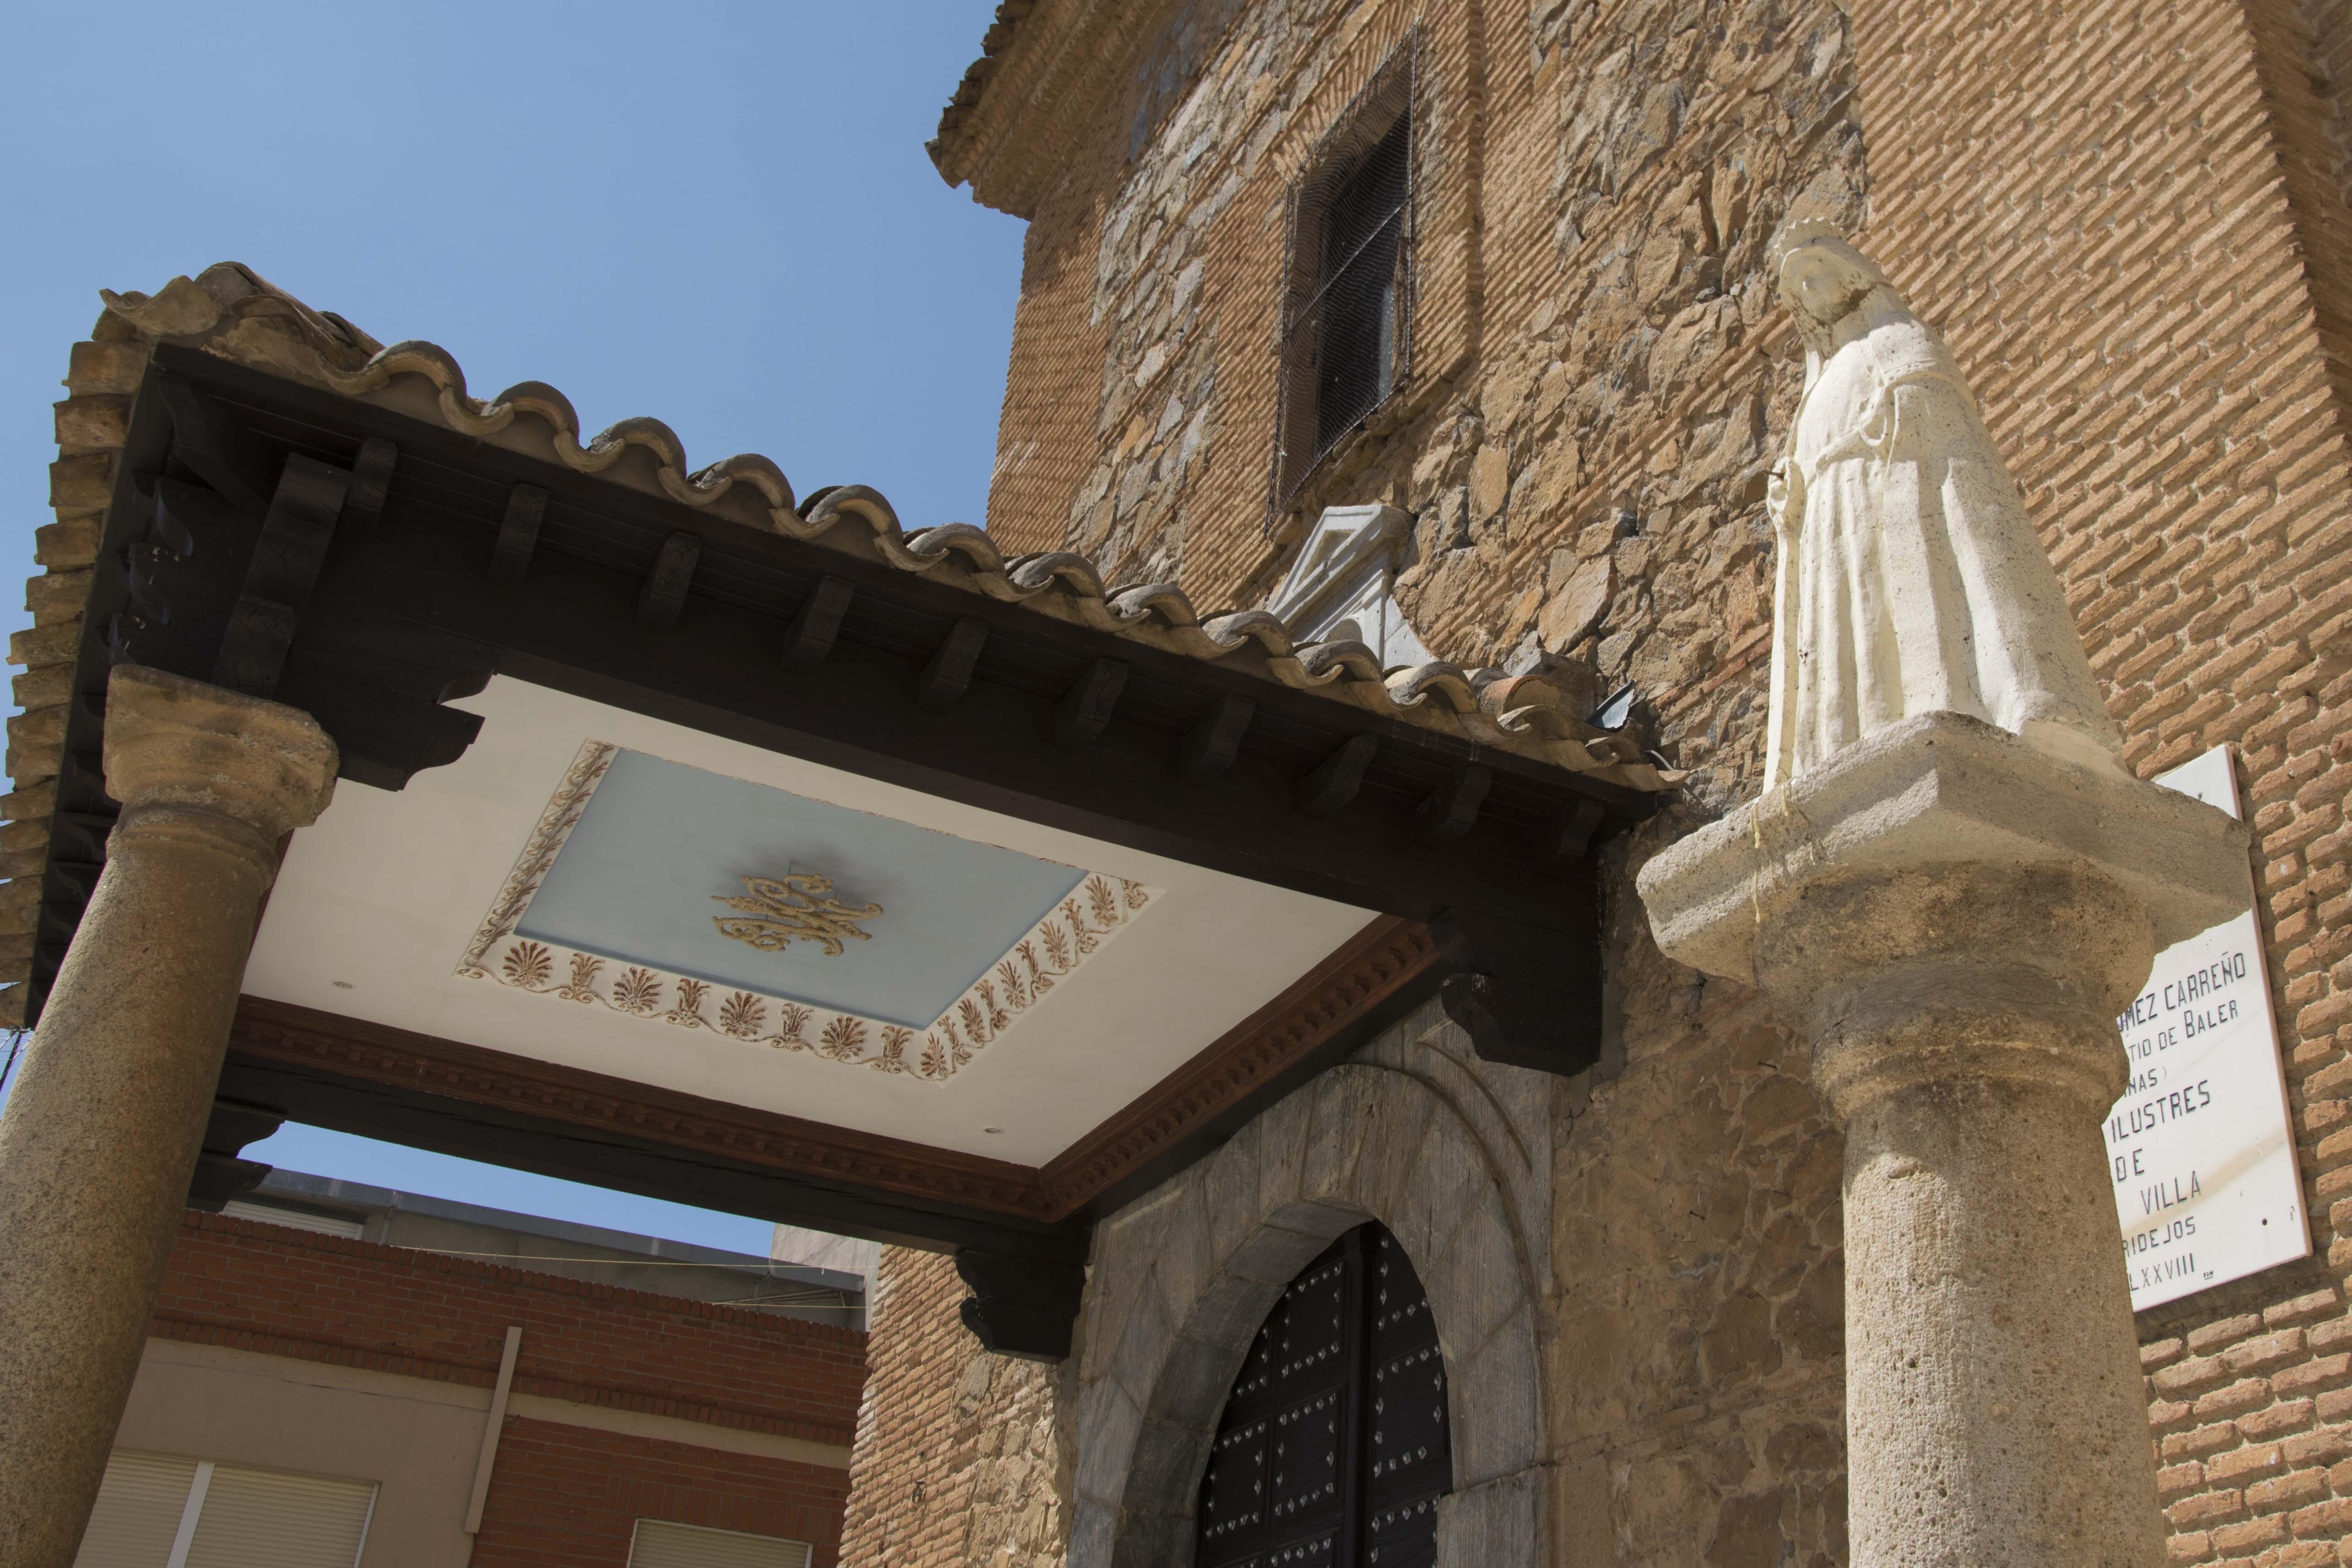 iglesia convento san francisco madridejos